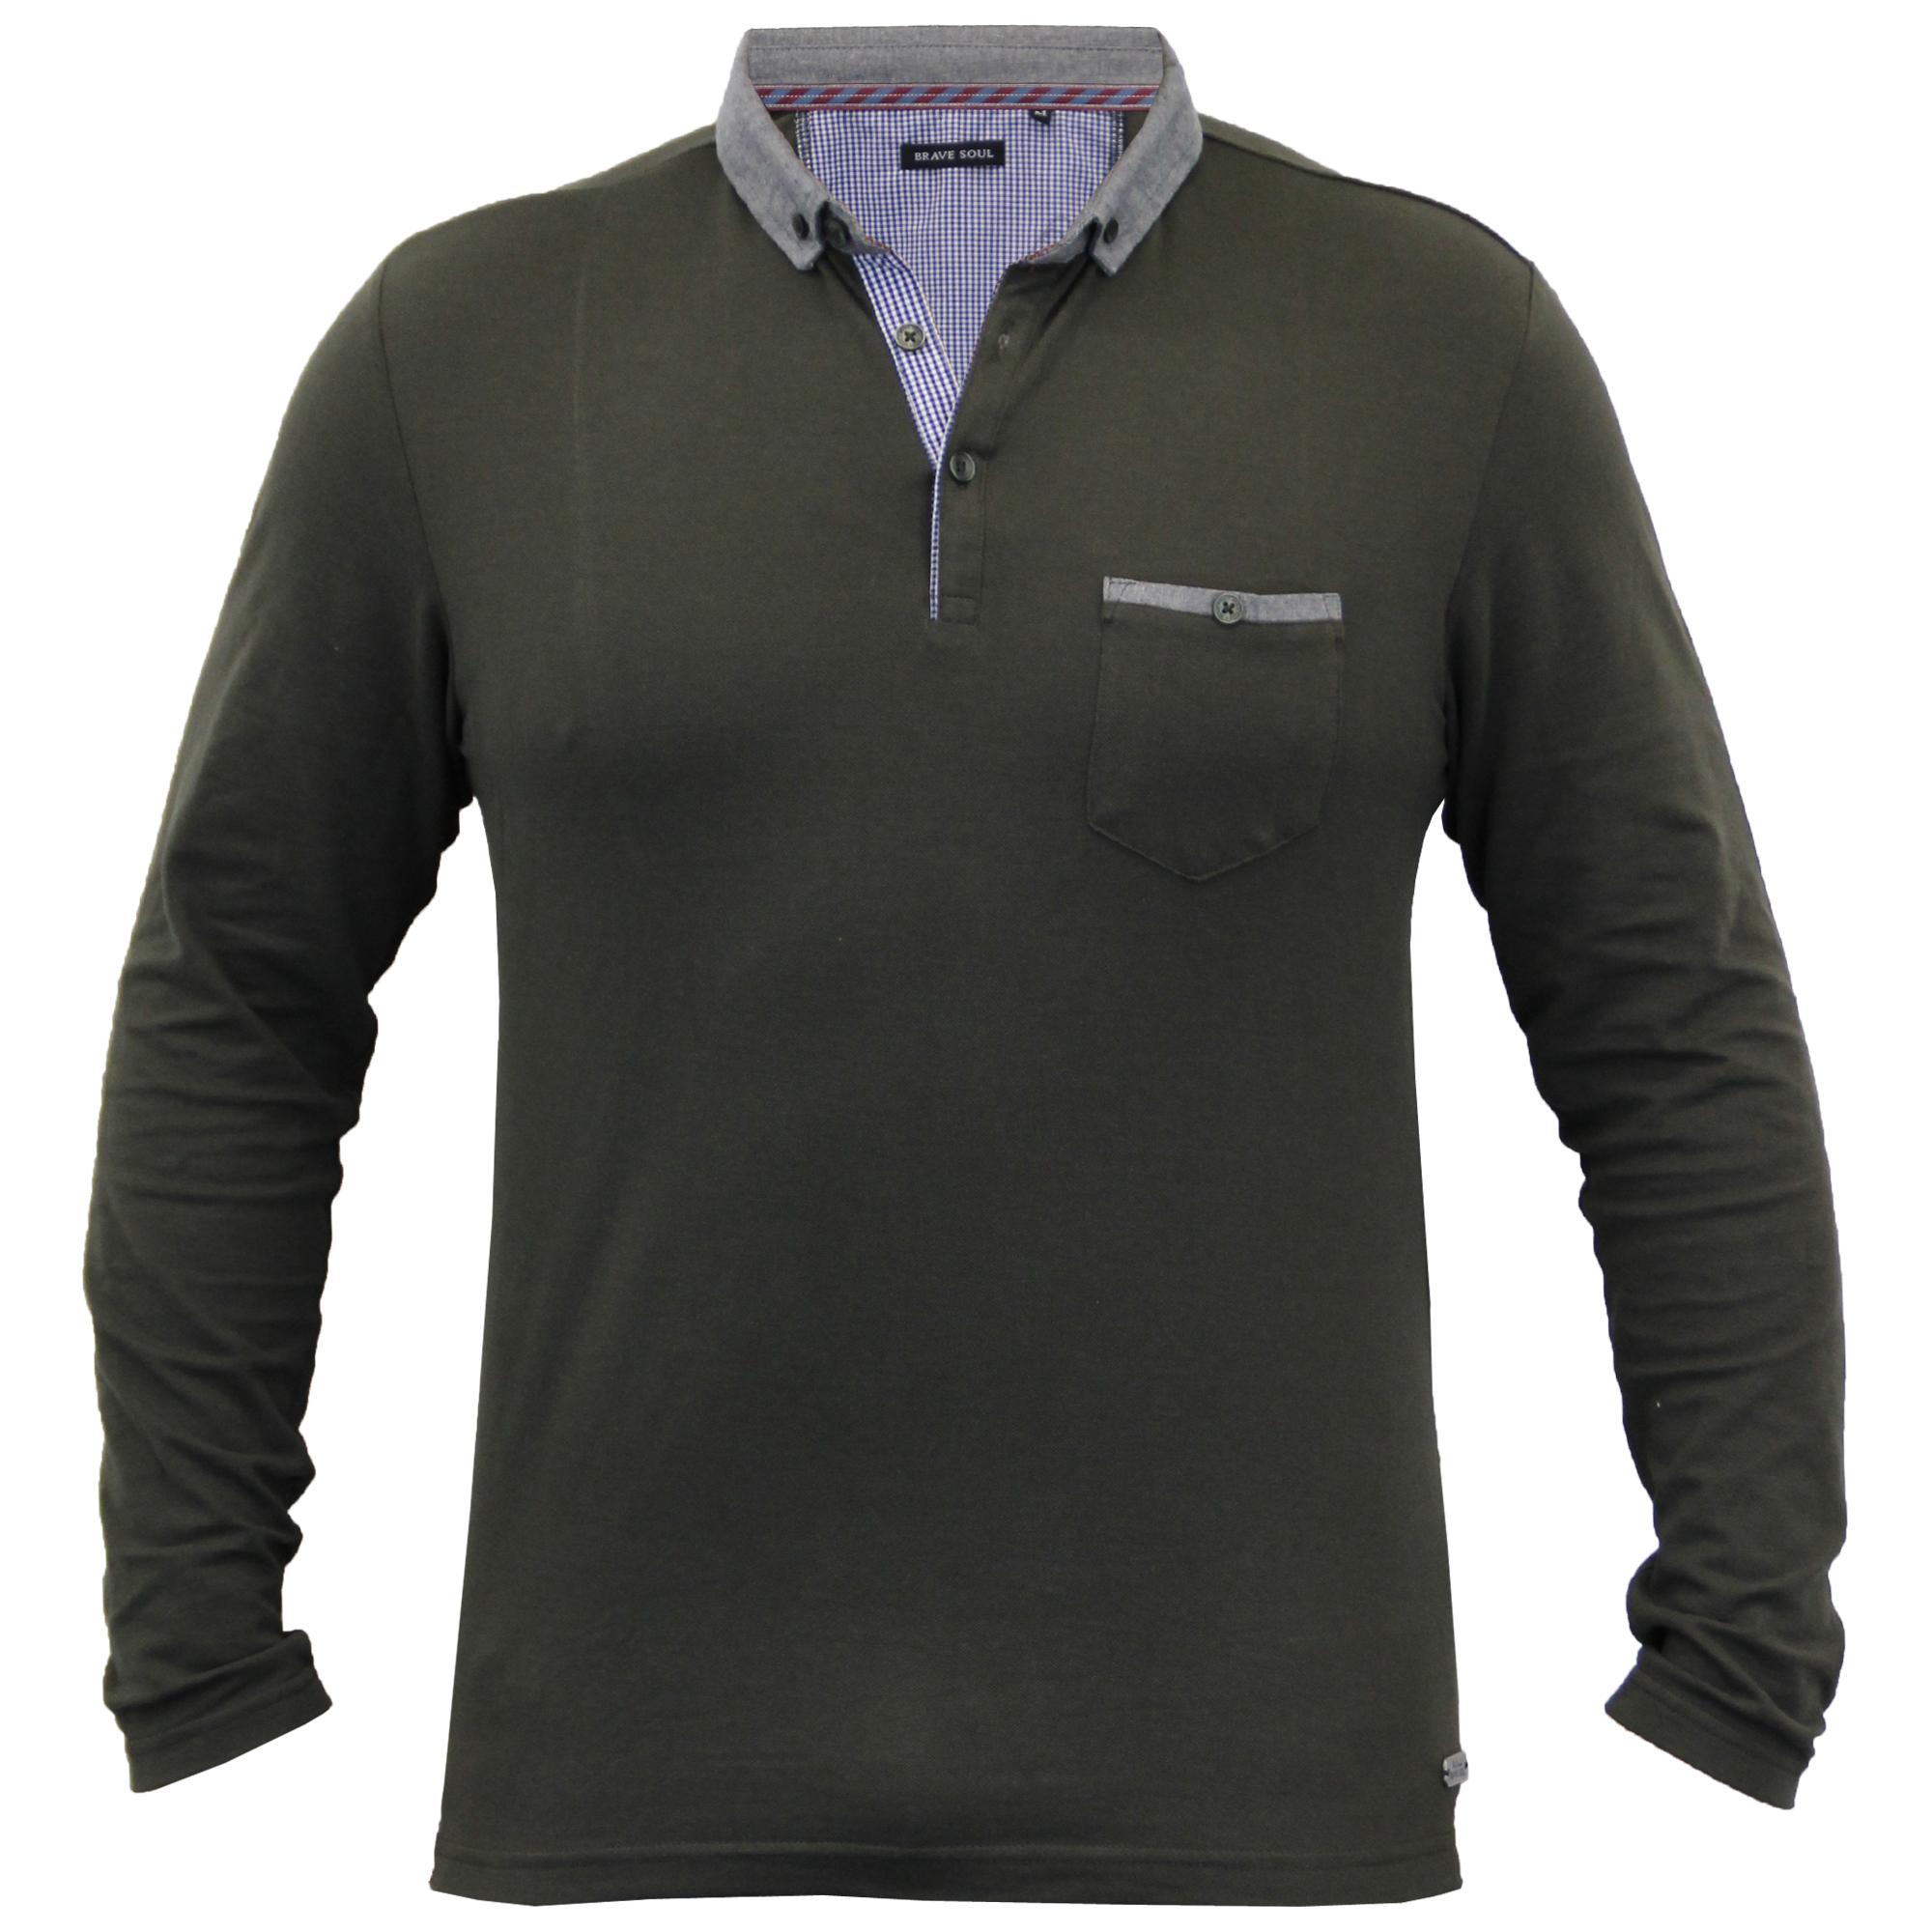 Homme-a-Manches-Longues-Jersey-Top-Brave-Soul-Pique-Polo-T-Shirt-A-Col-Ete-Neuf miniature 18